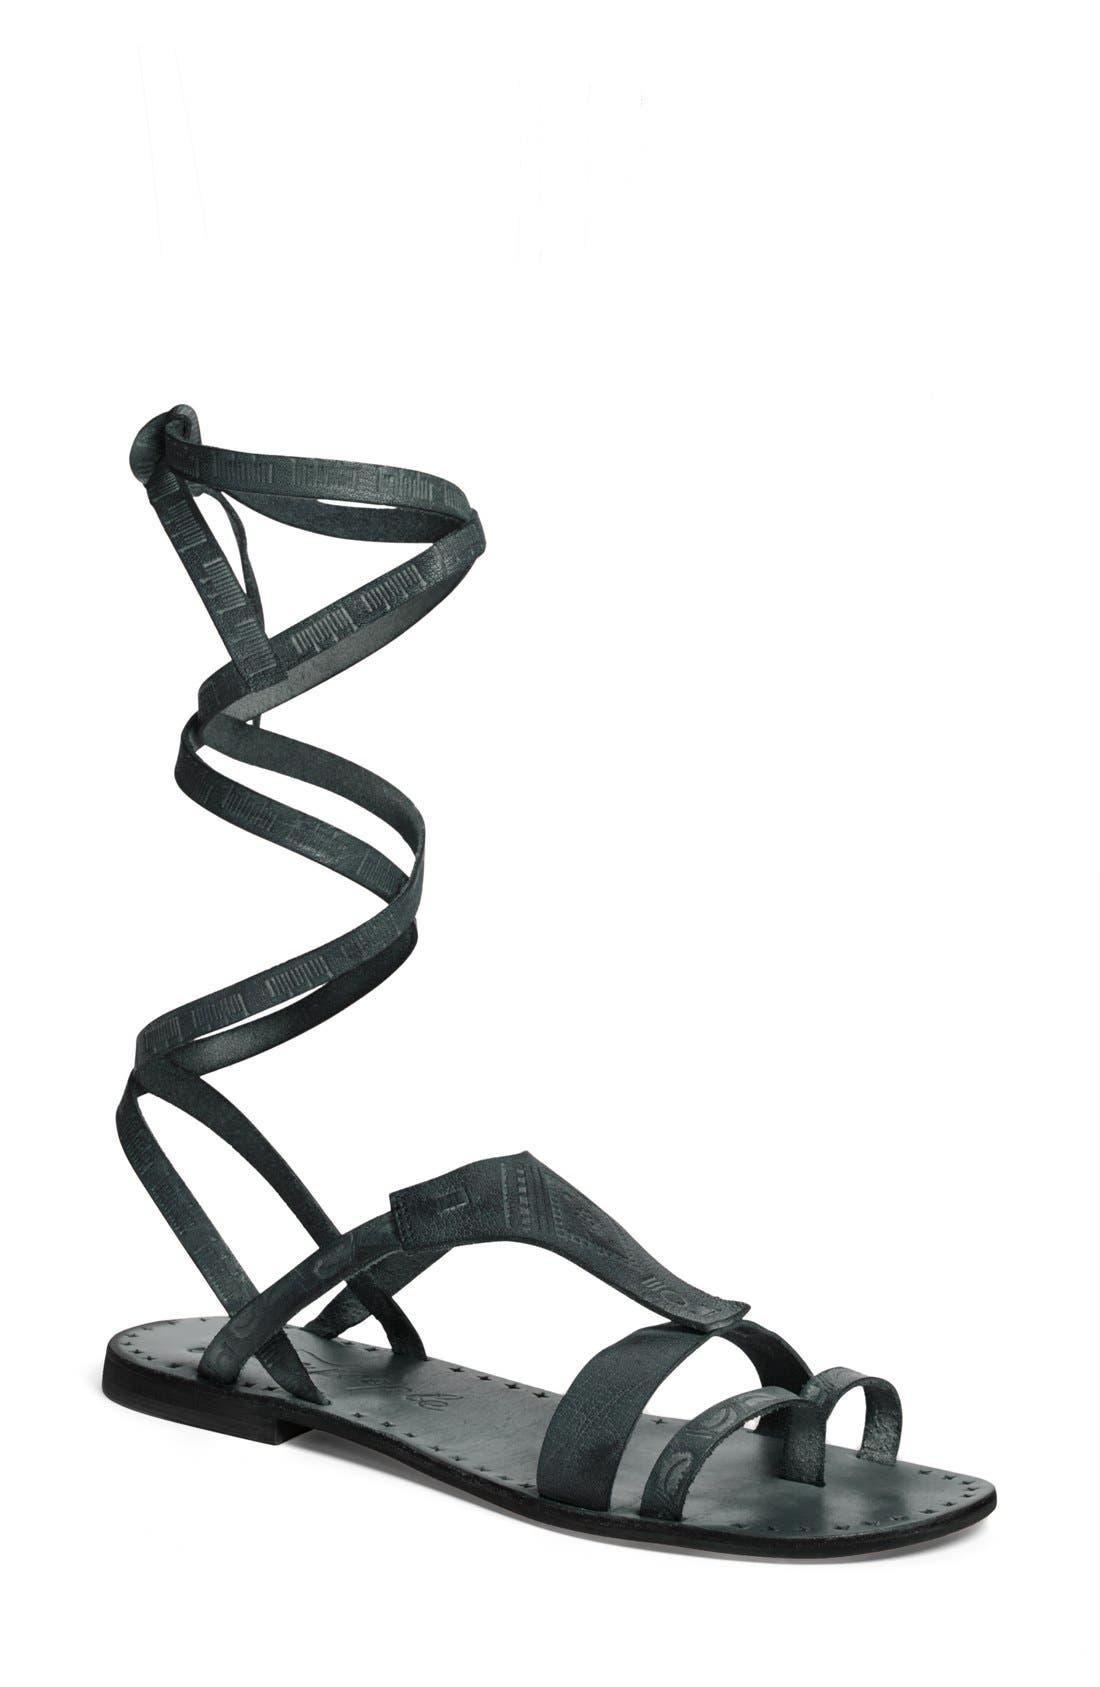 Alternate Image 1 Selected - Free People 'Oliviera' Gladiator Sandal (Women)